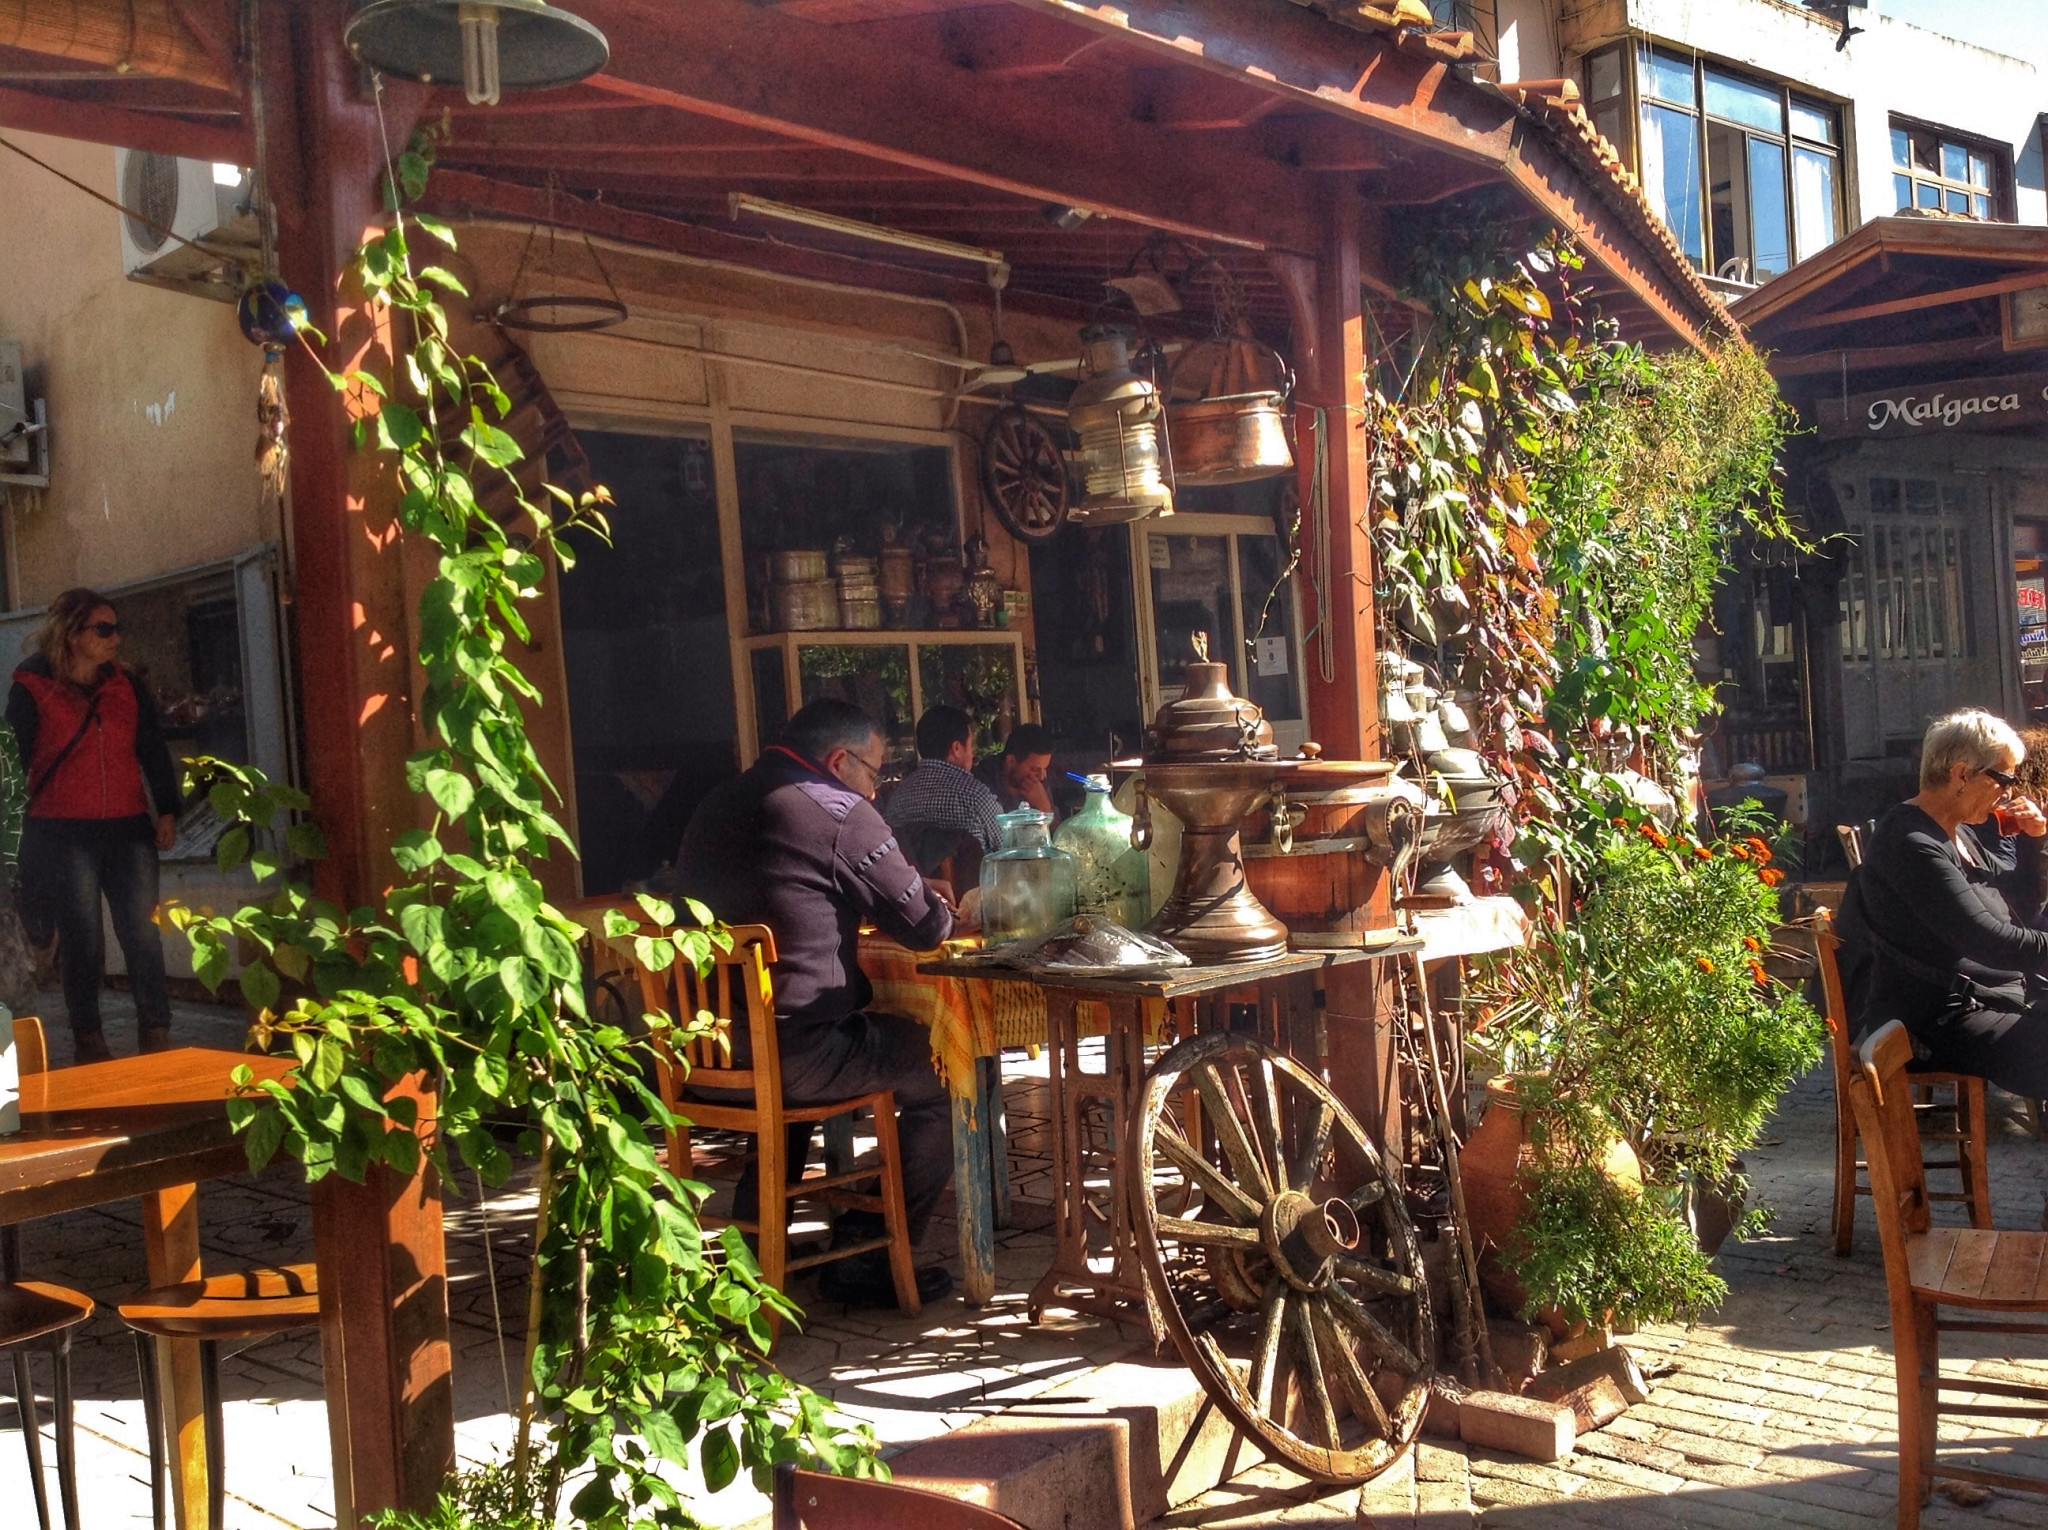 Urla Malgaca Pazarı Kafe